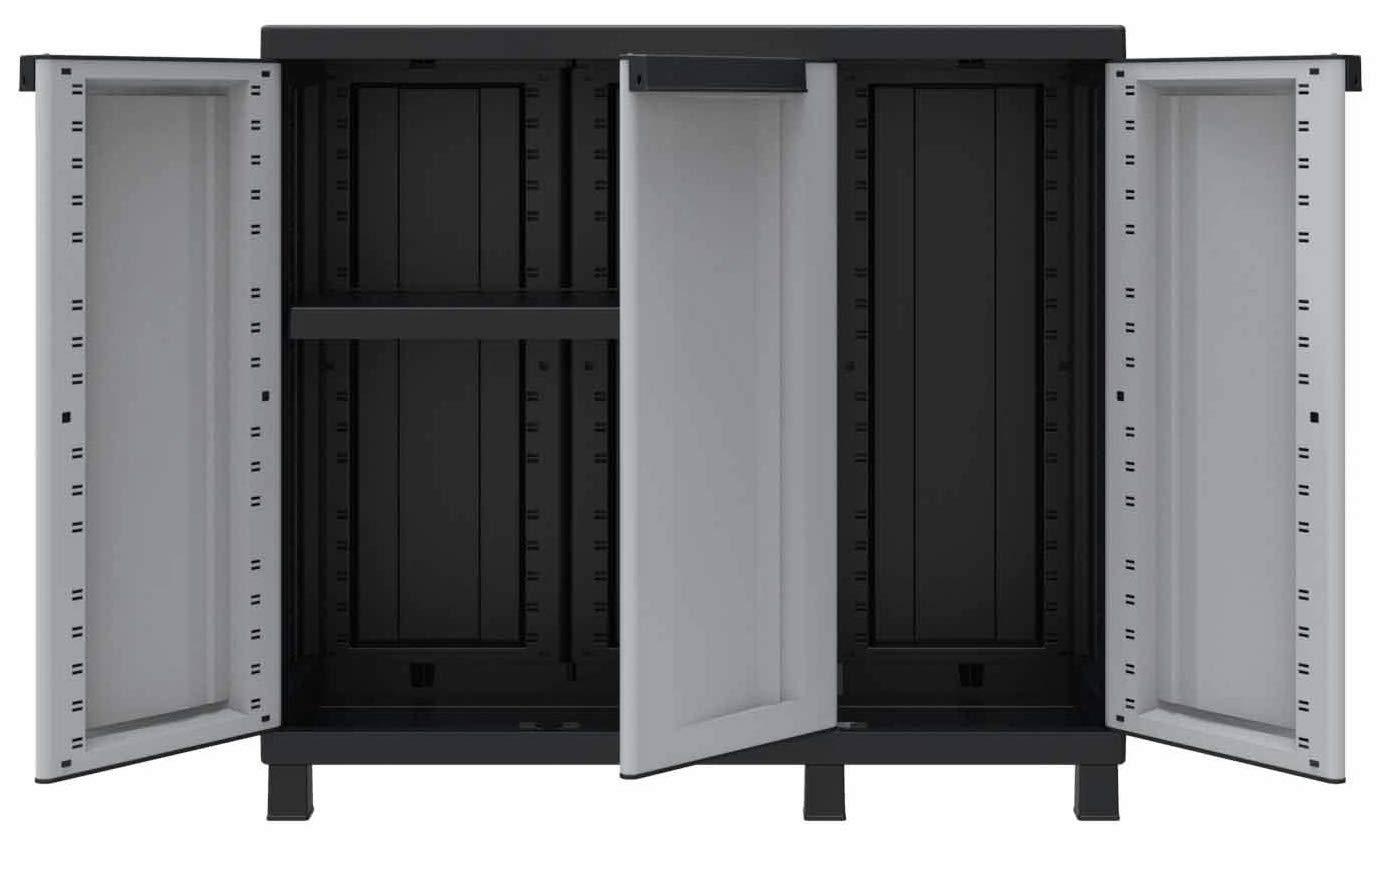 Terry armario pl stico exterior 102 x 39 x 91 5 cm - Armario plastico exterior ...